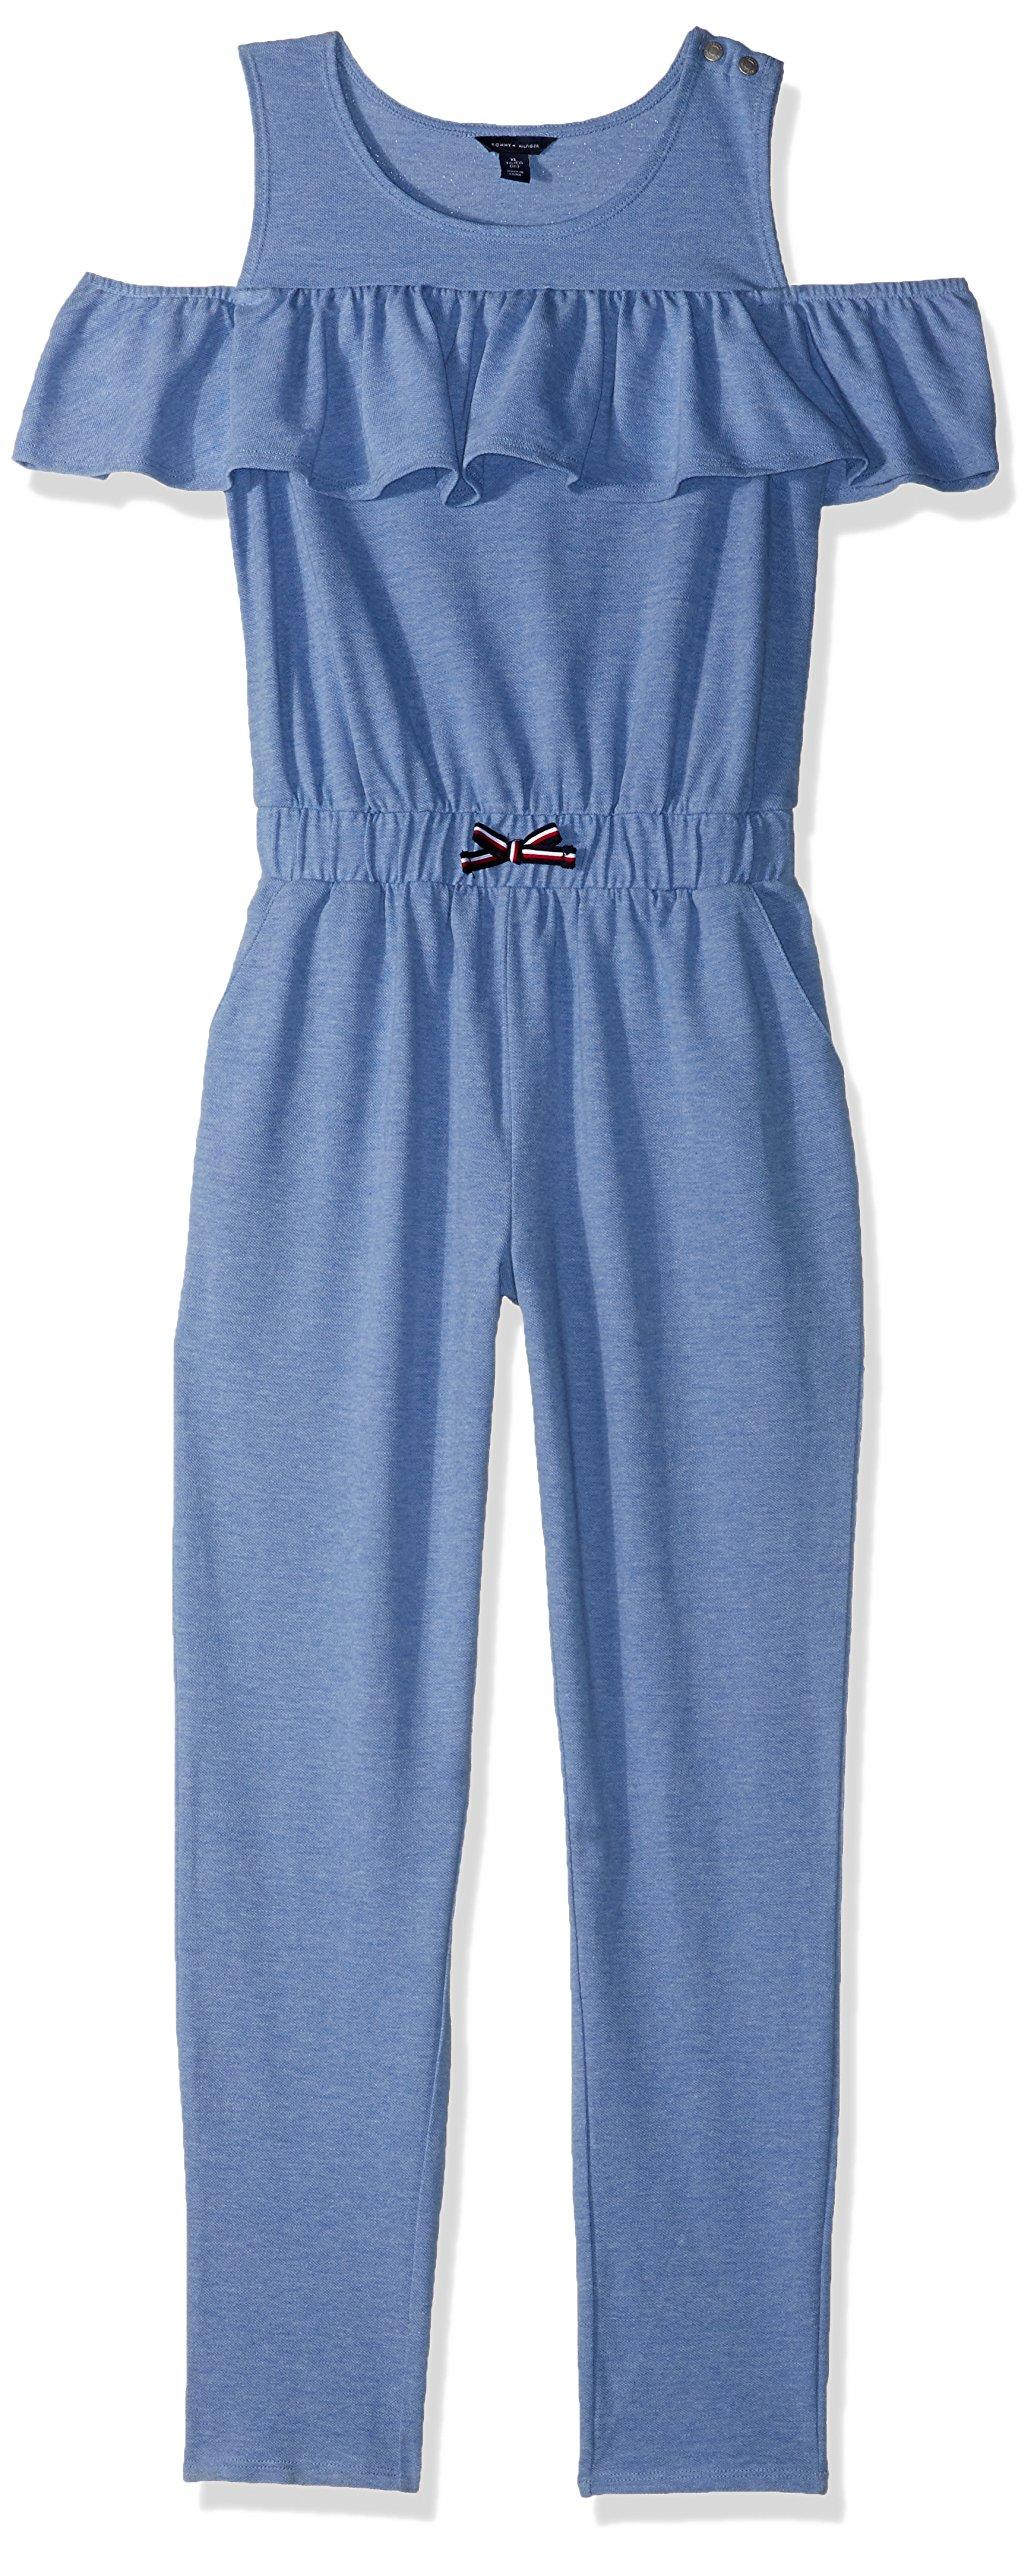 Tommy Hilfiger Big Girls' Printed Jumpsuit, Clear/Blue Heather, Large (12/14)